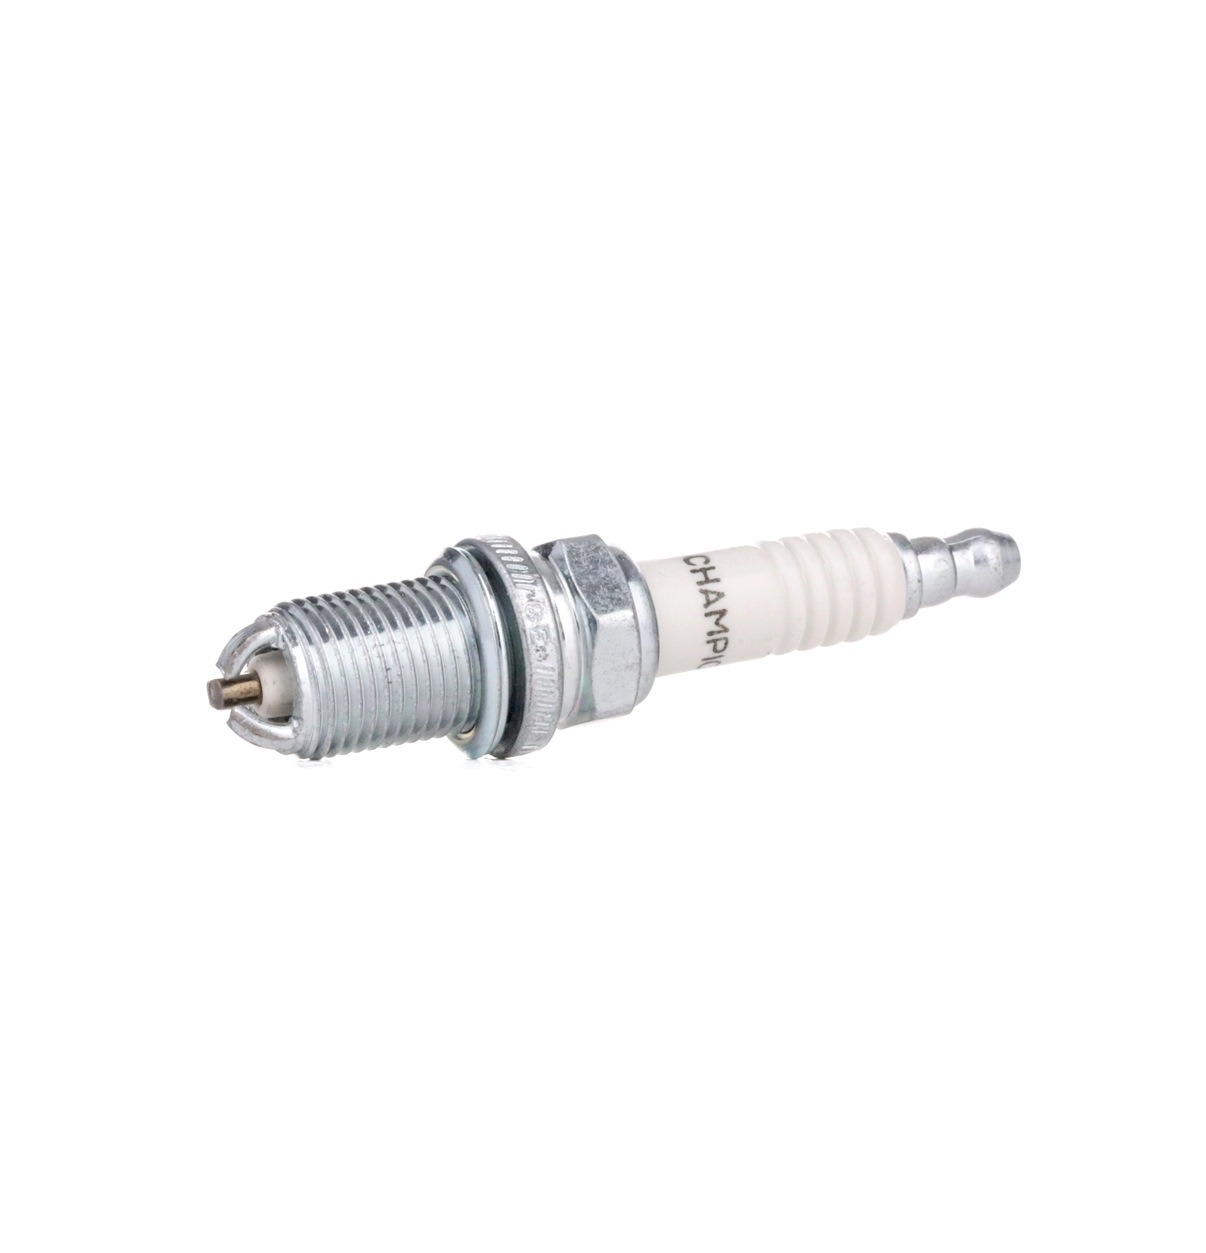 Spark Plug CHAMPION OE077 rating